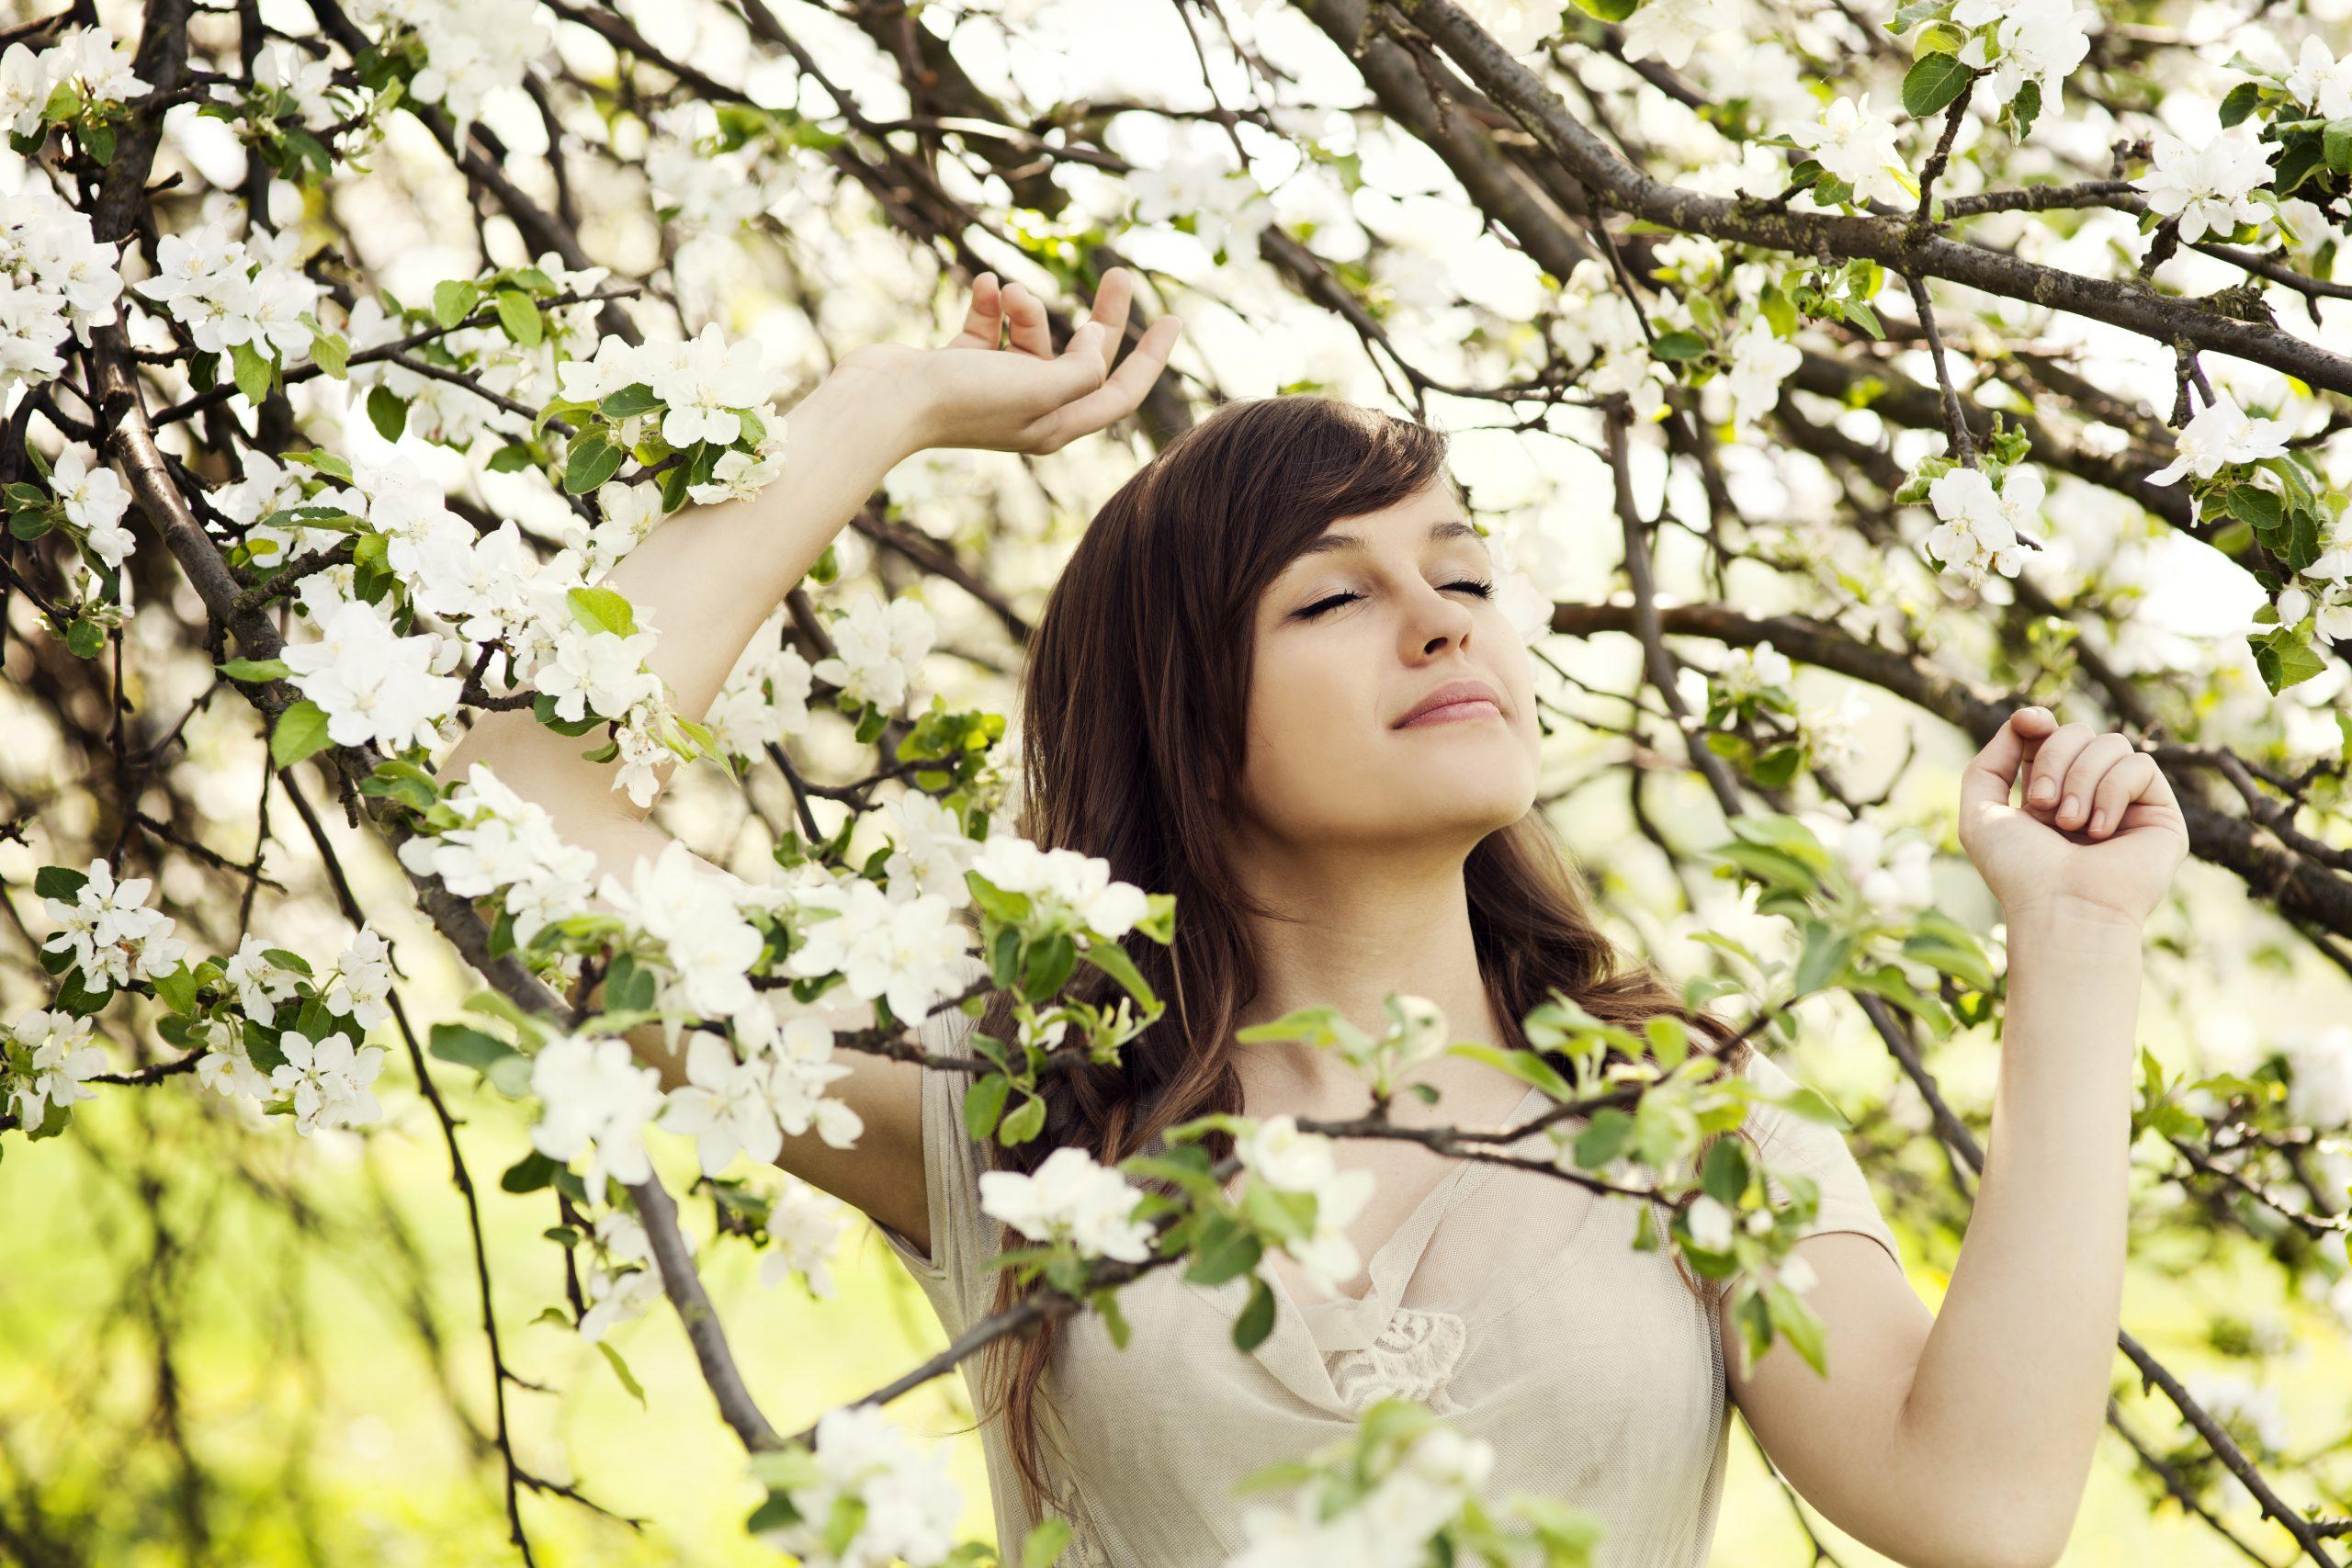 Spring is in the air- Freepik